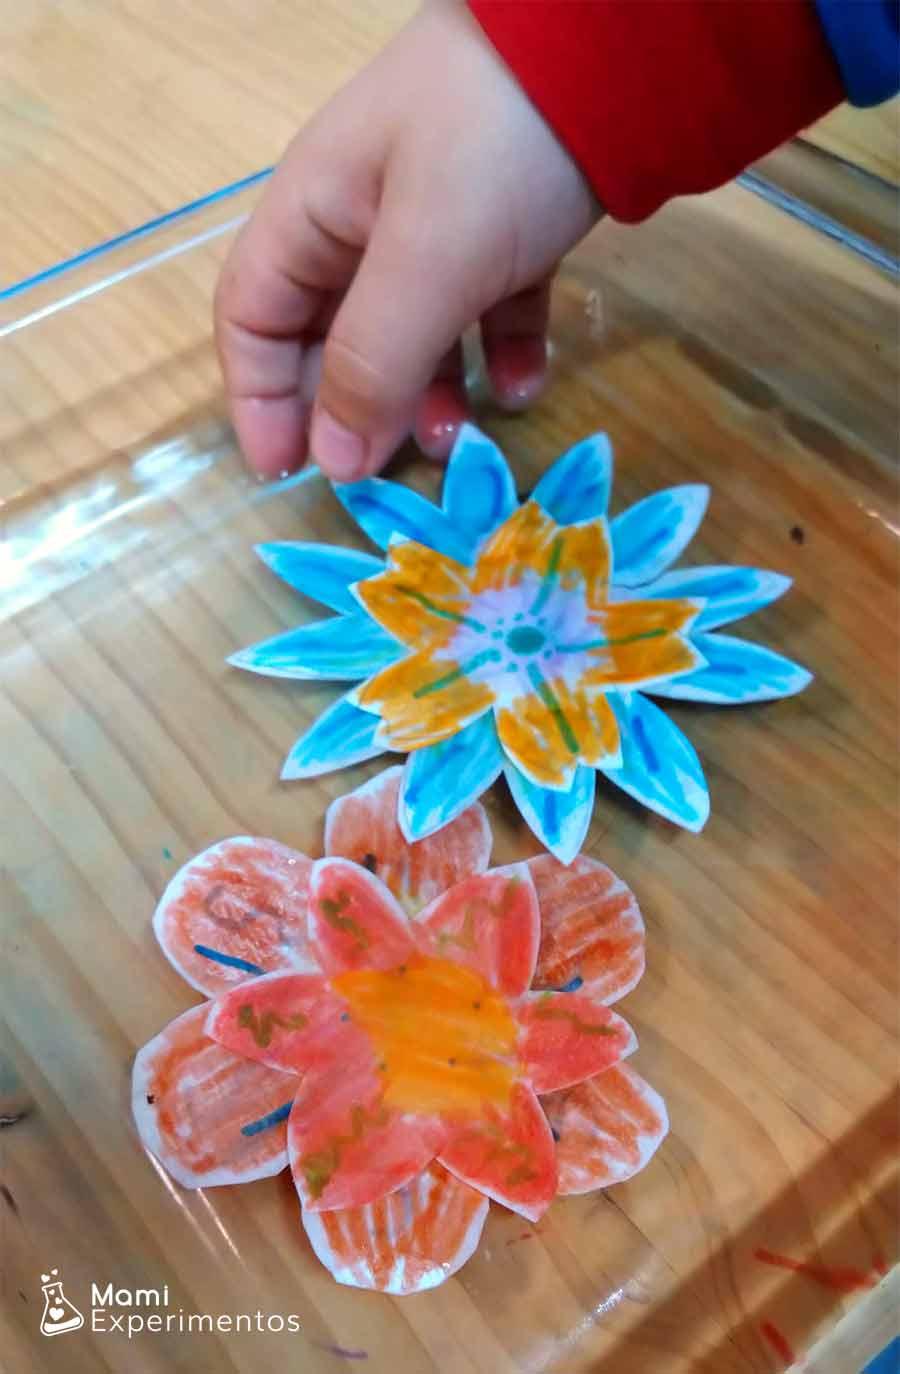 Flores de colores experimento capilaridad flores que se abren